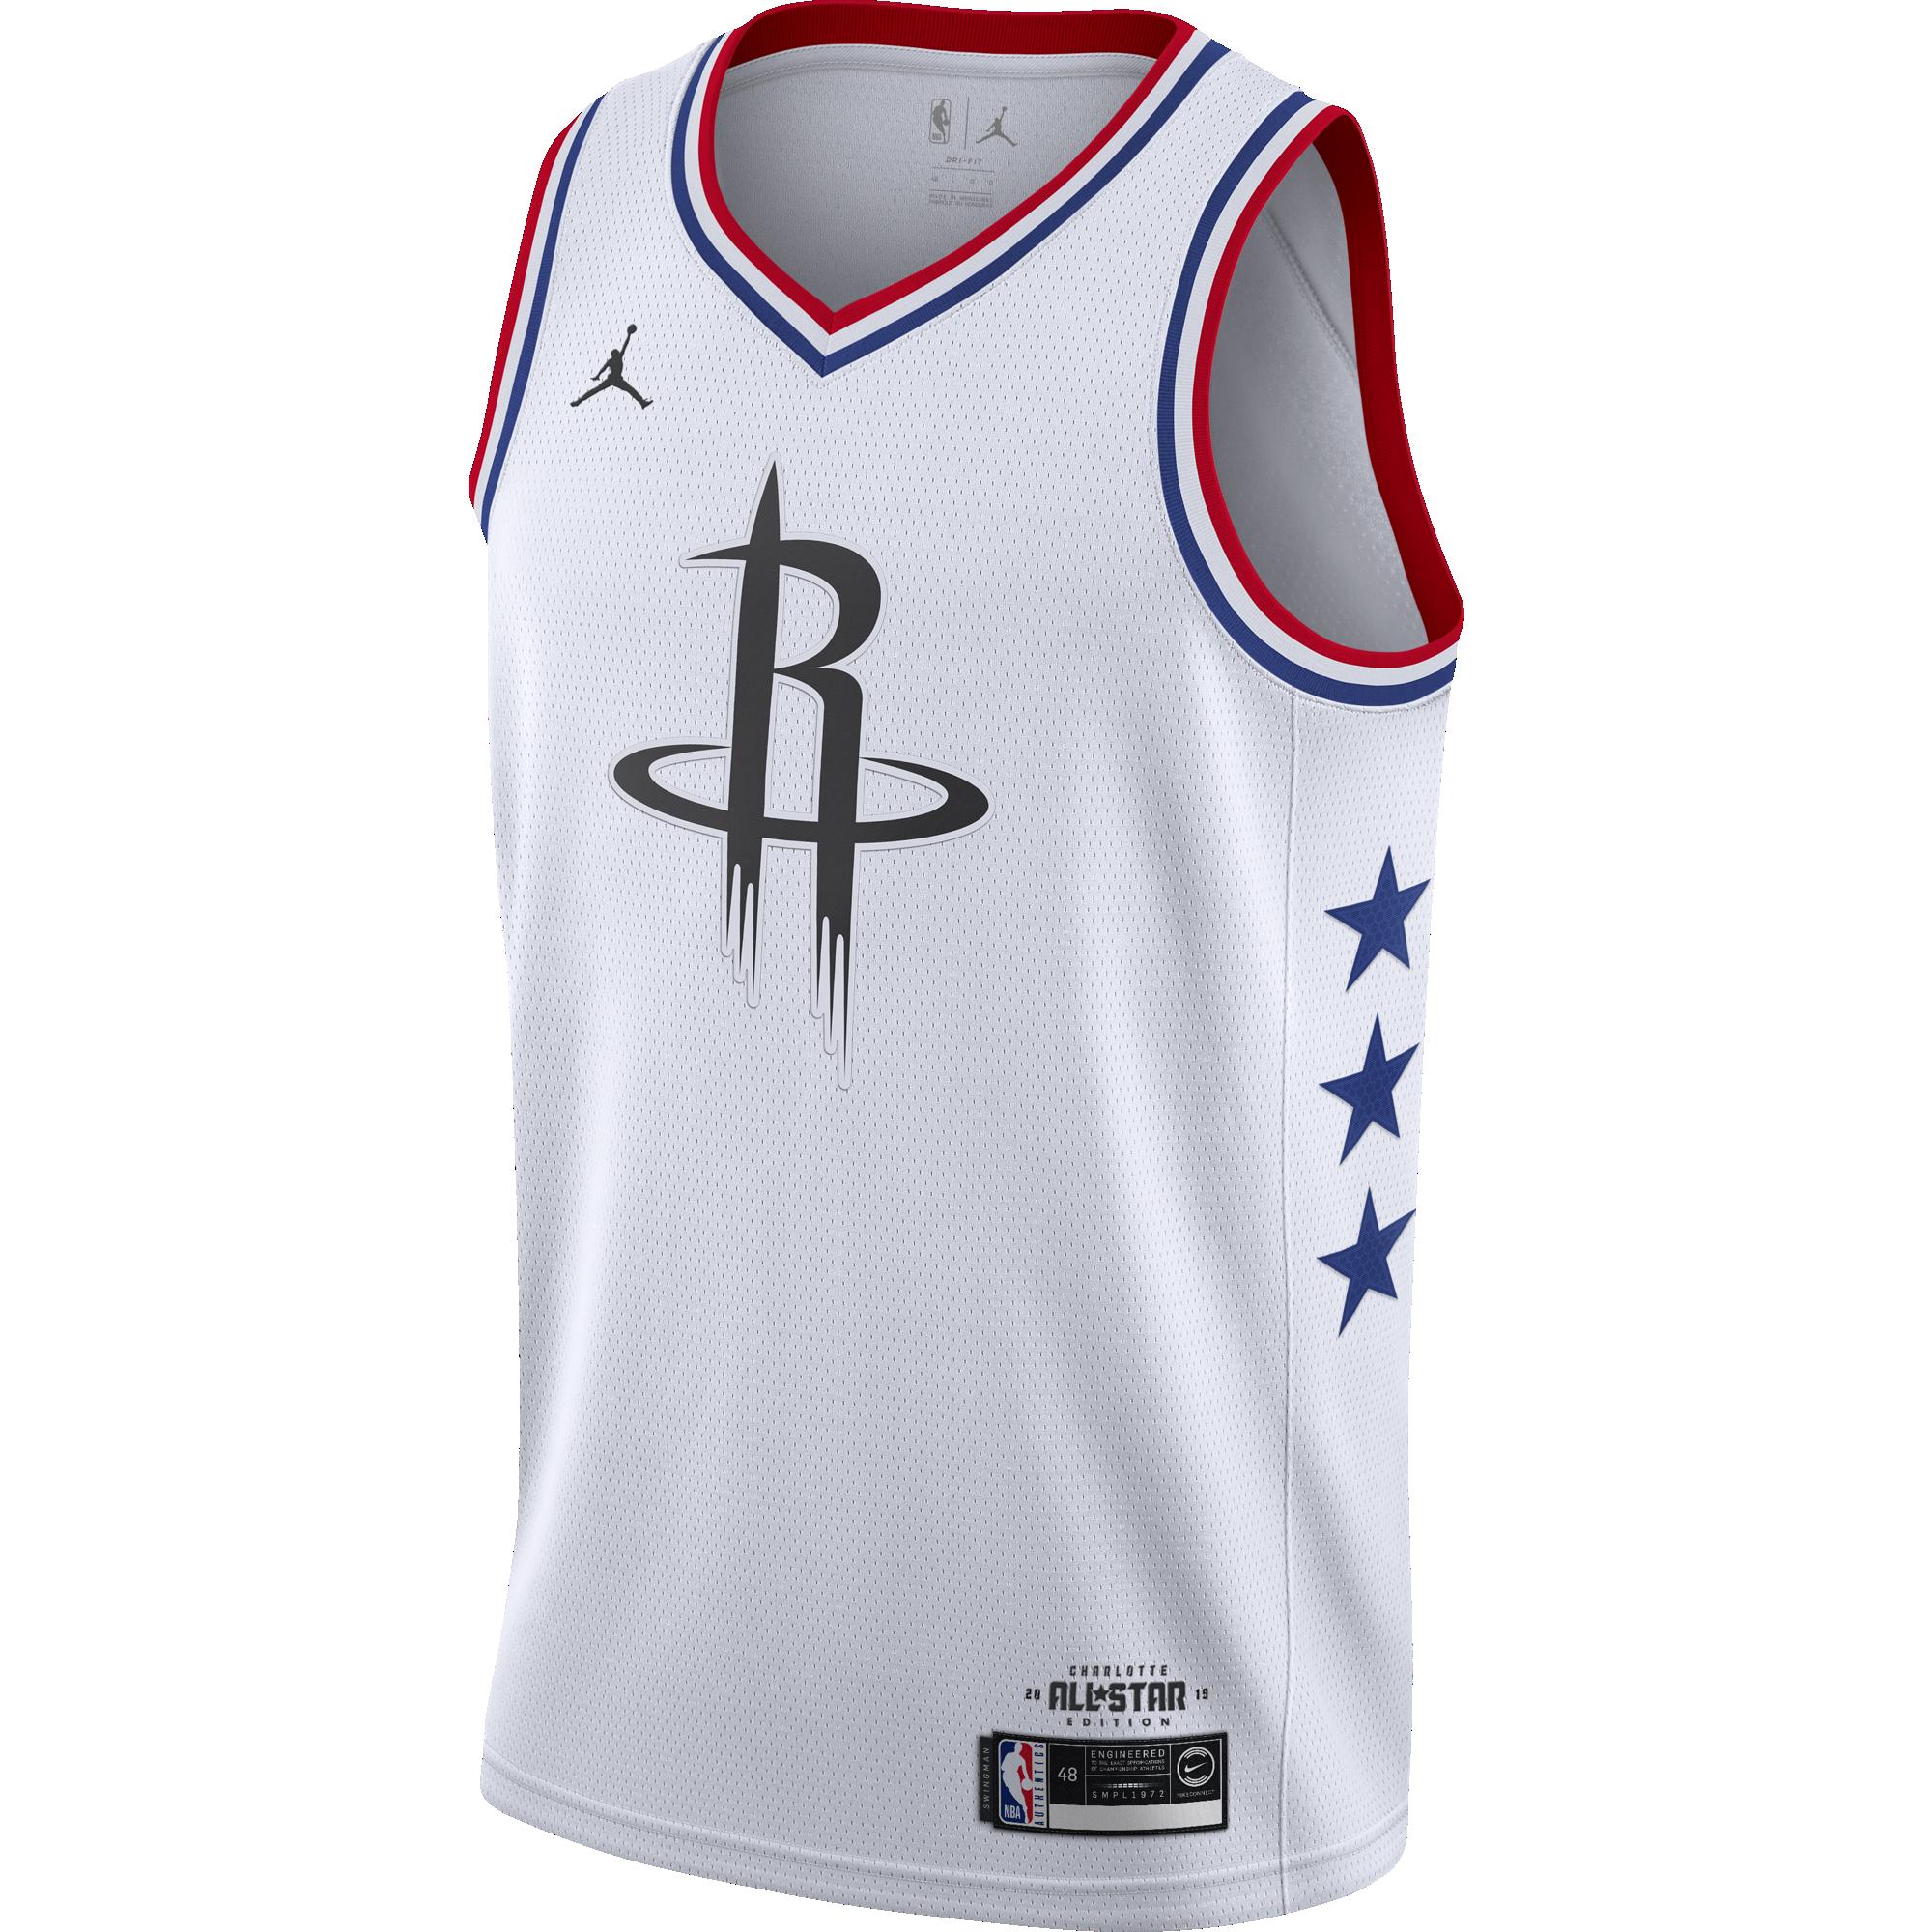 new style 22c8c 26270 AIR JORDAN NBA ALL STAR WEEKEND 2019 JAMES HARDEN SWINGMAN ...